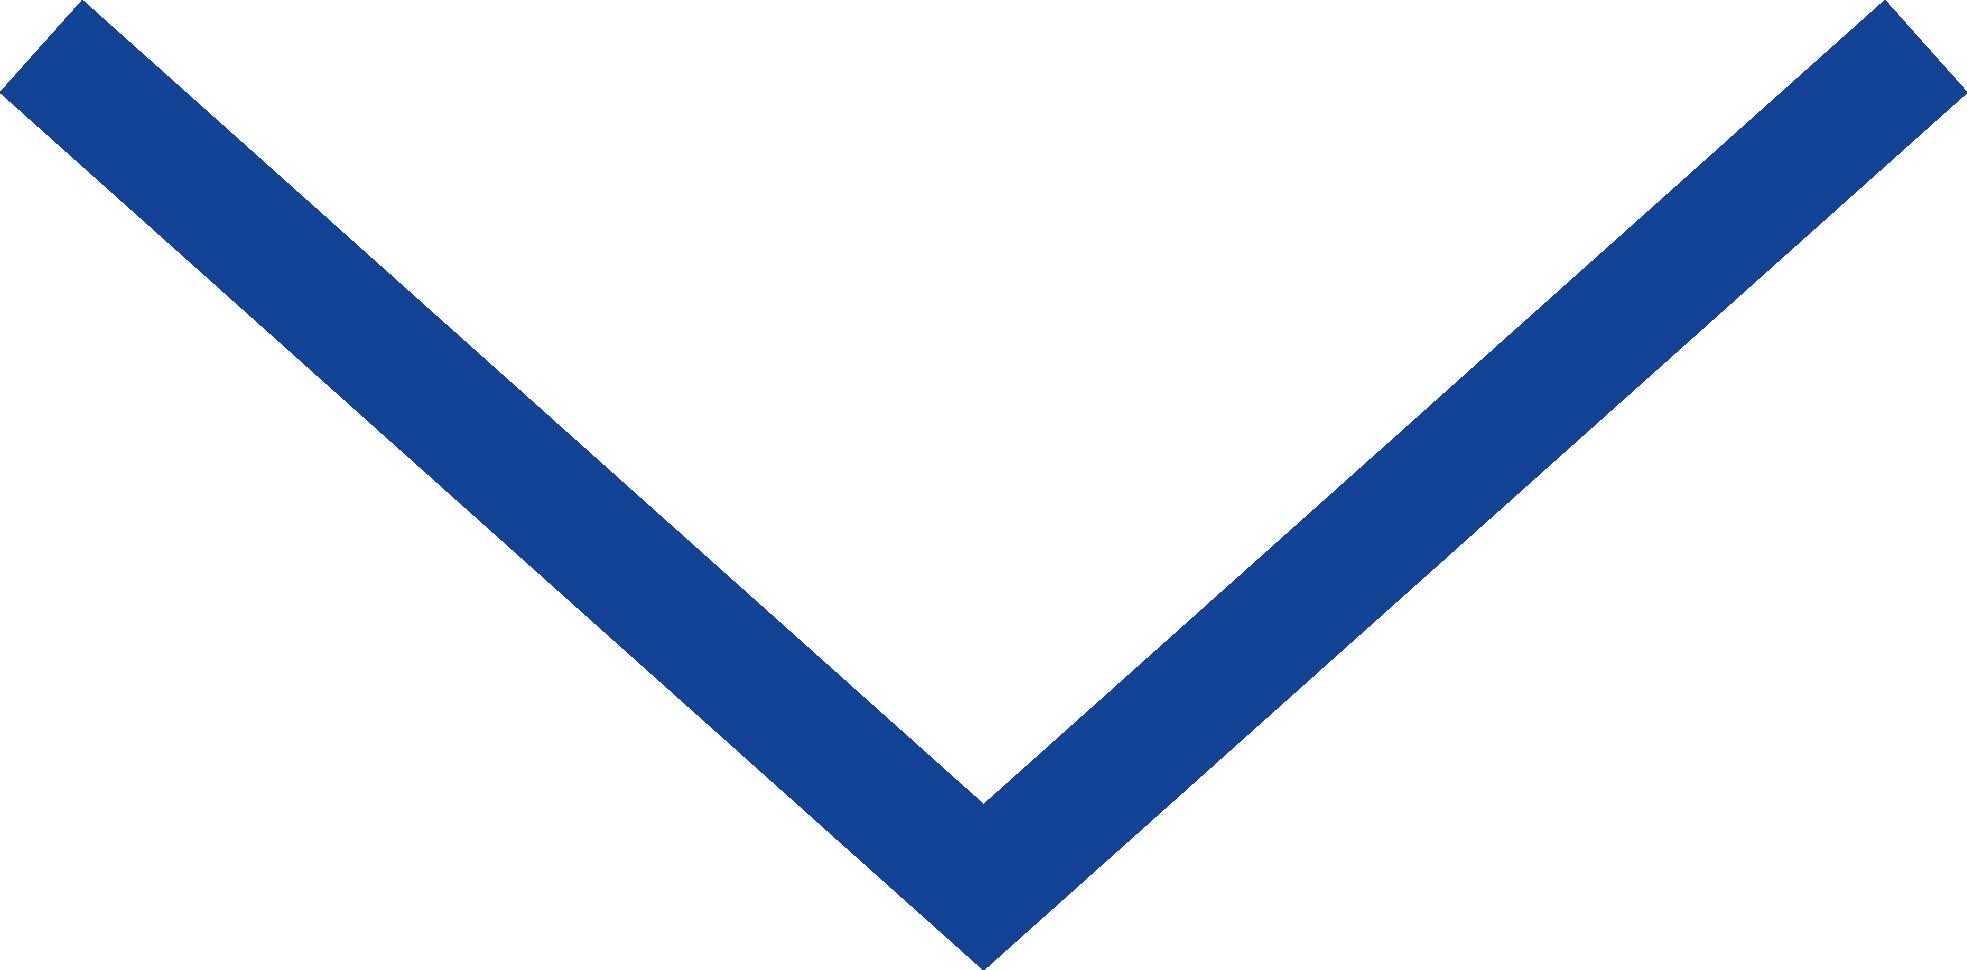 Icon Arrow Down Blue